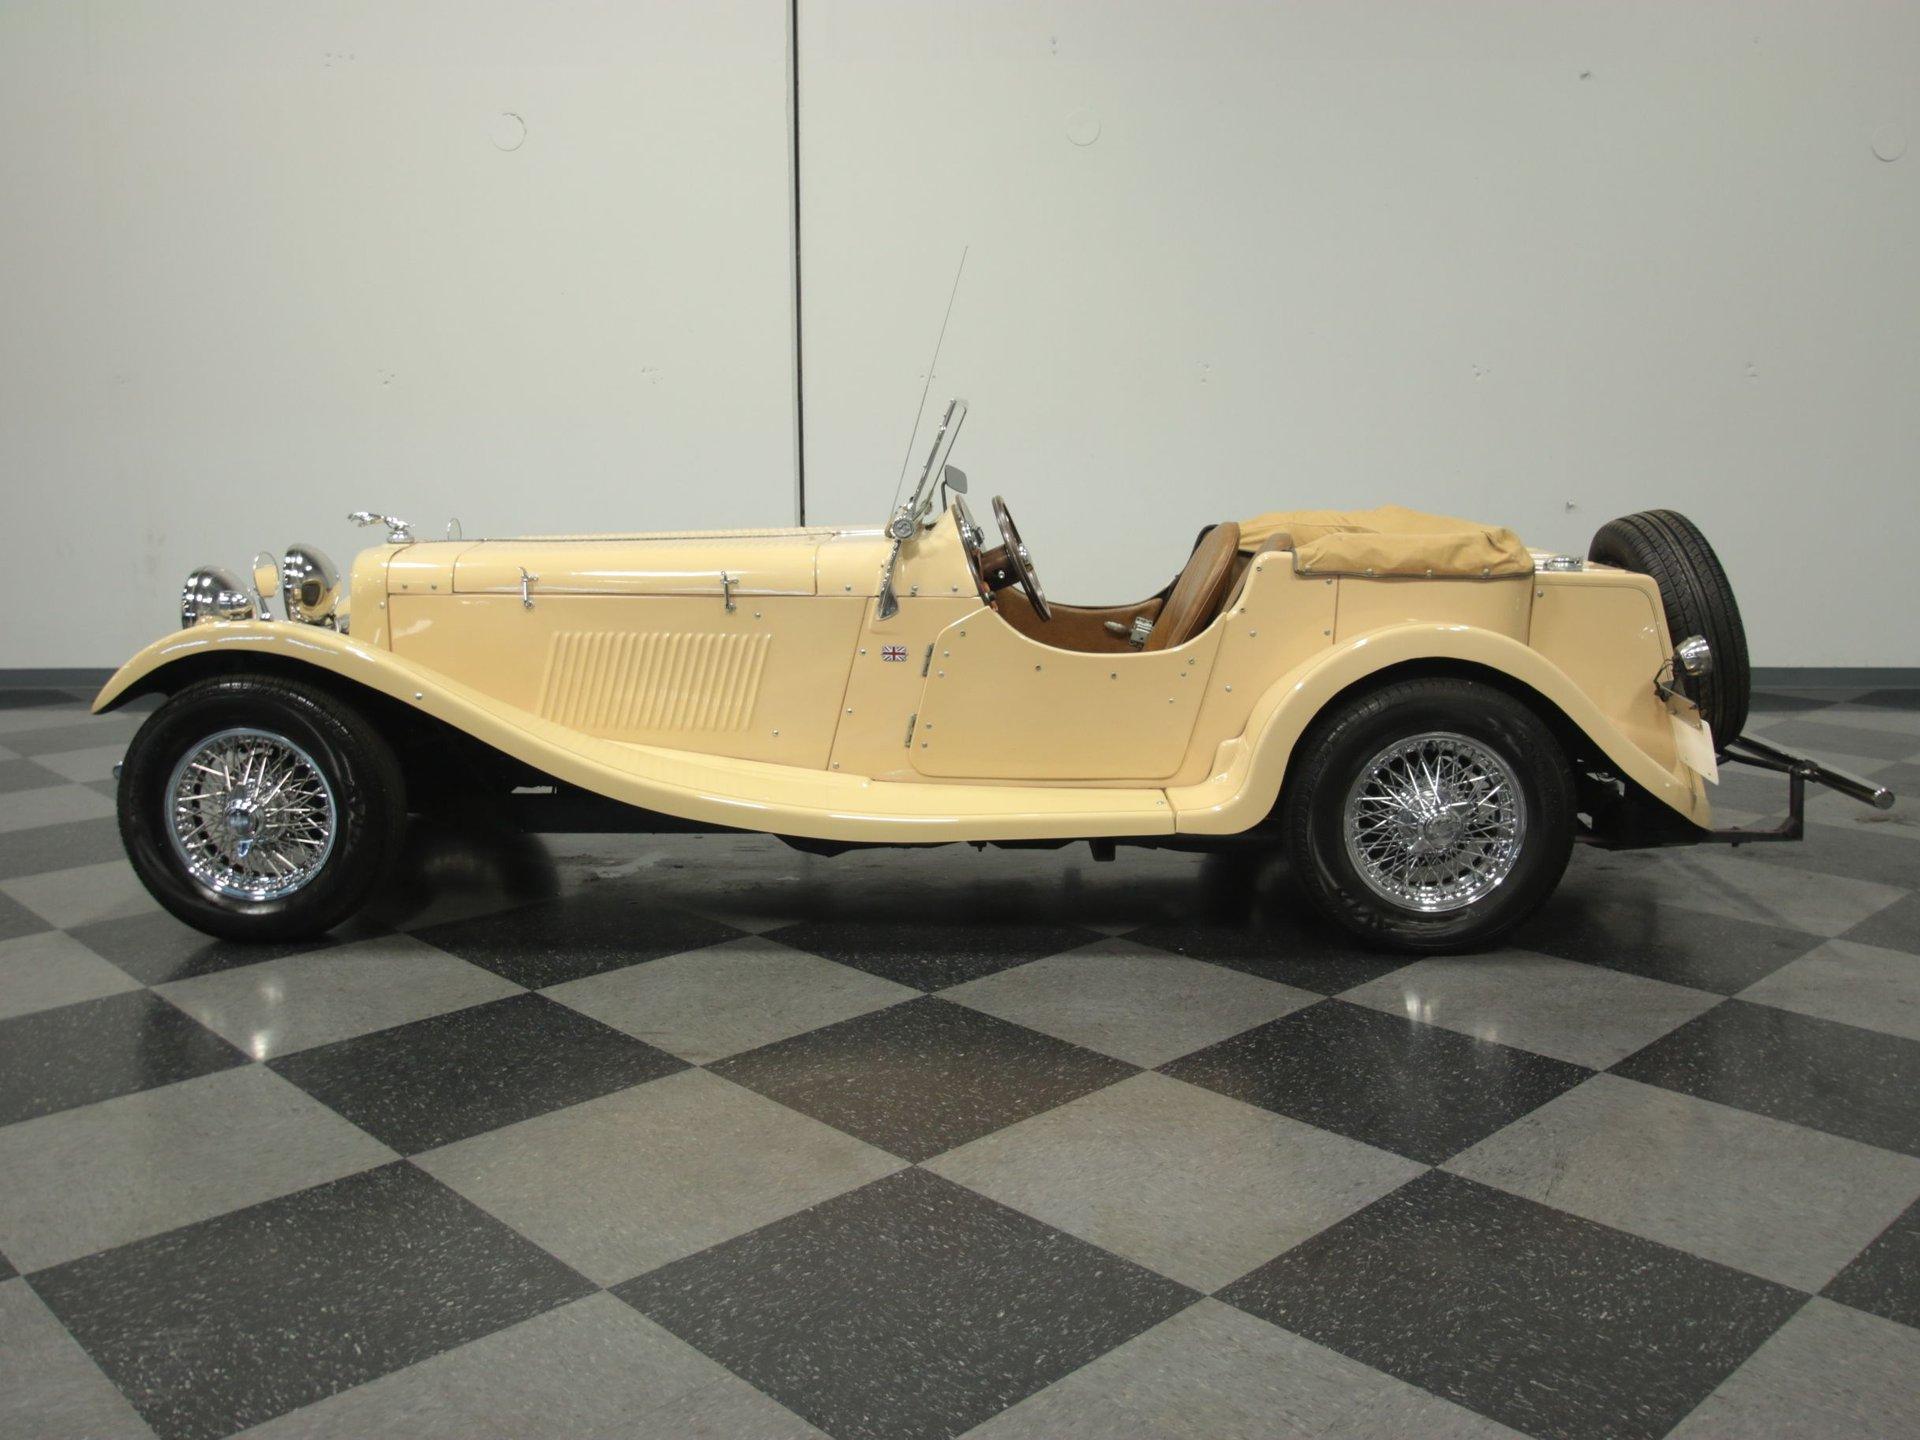 1982 jaguar ss100 replica